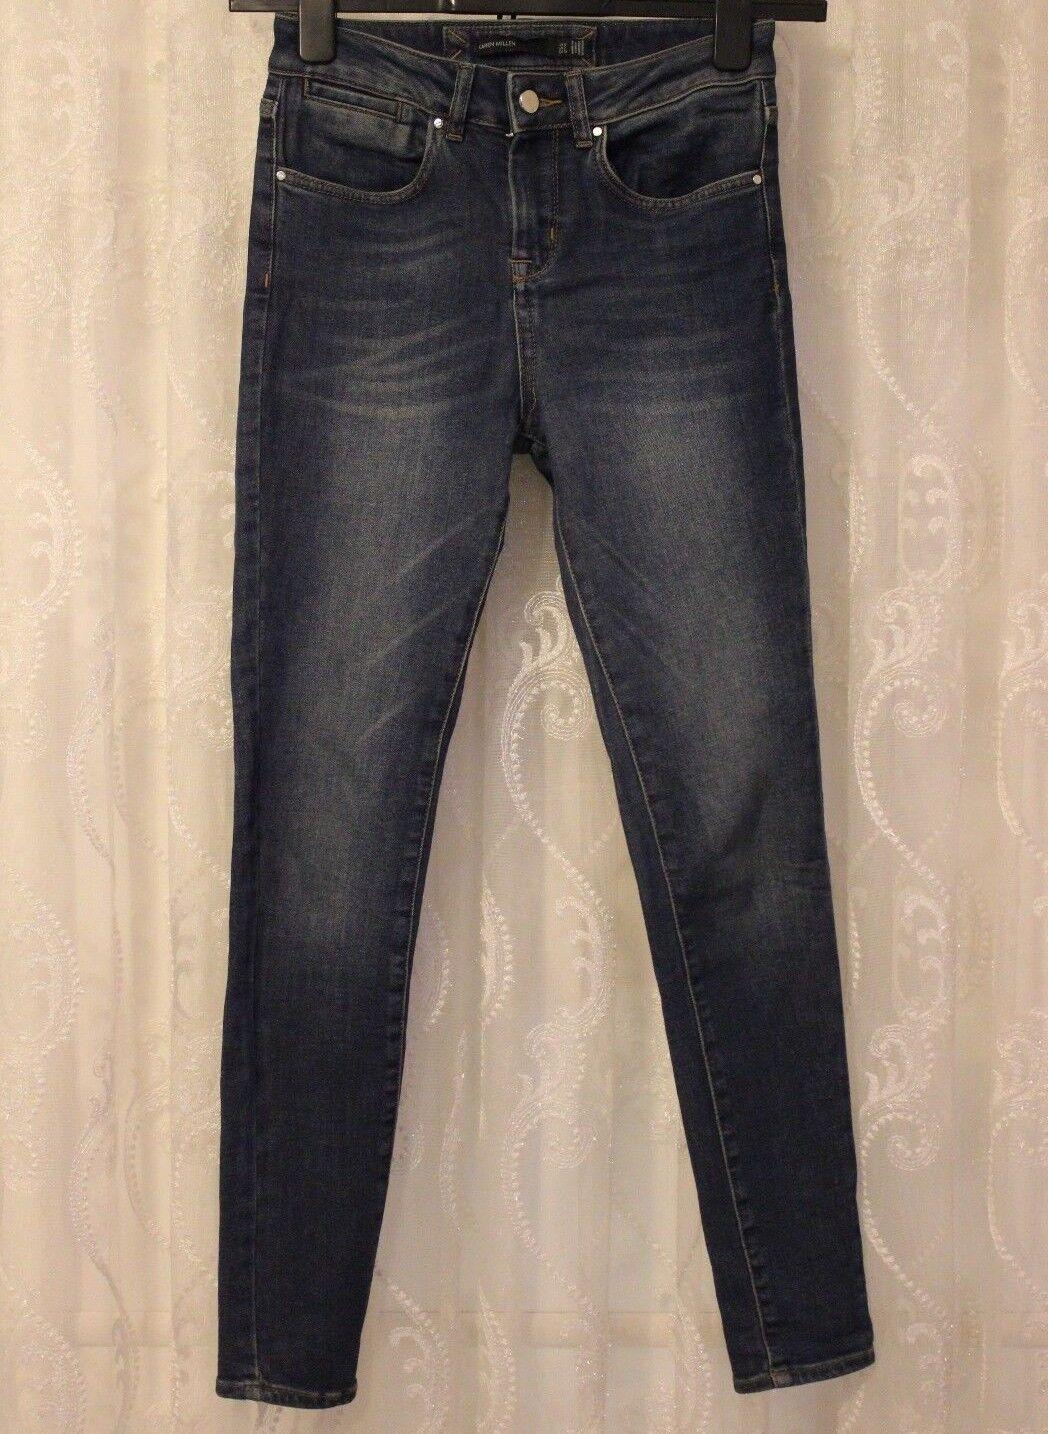 Karen Millen blu blu blu skinny stretch dritto Cotone Jeggings Pantaloni Jeans 9f4bd5